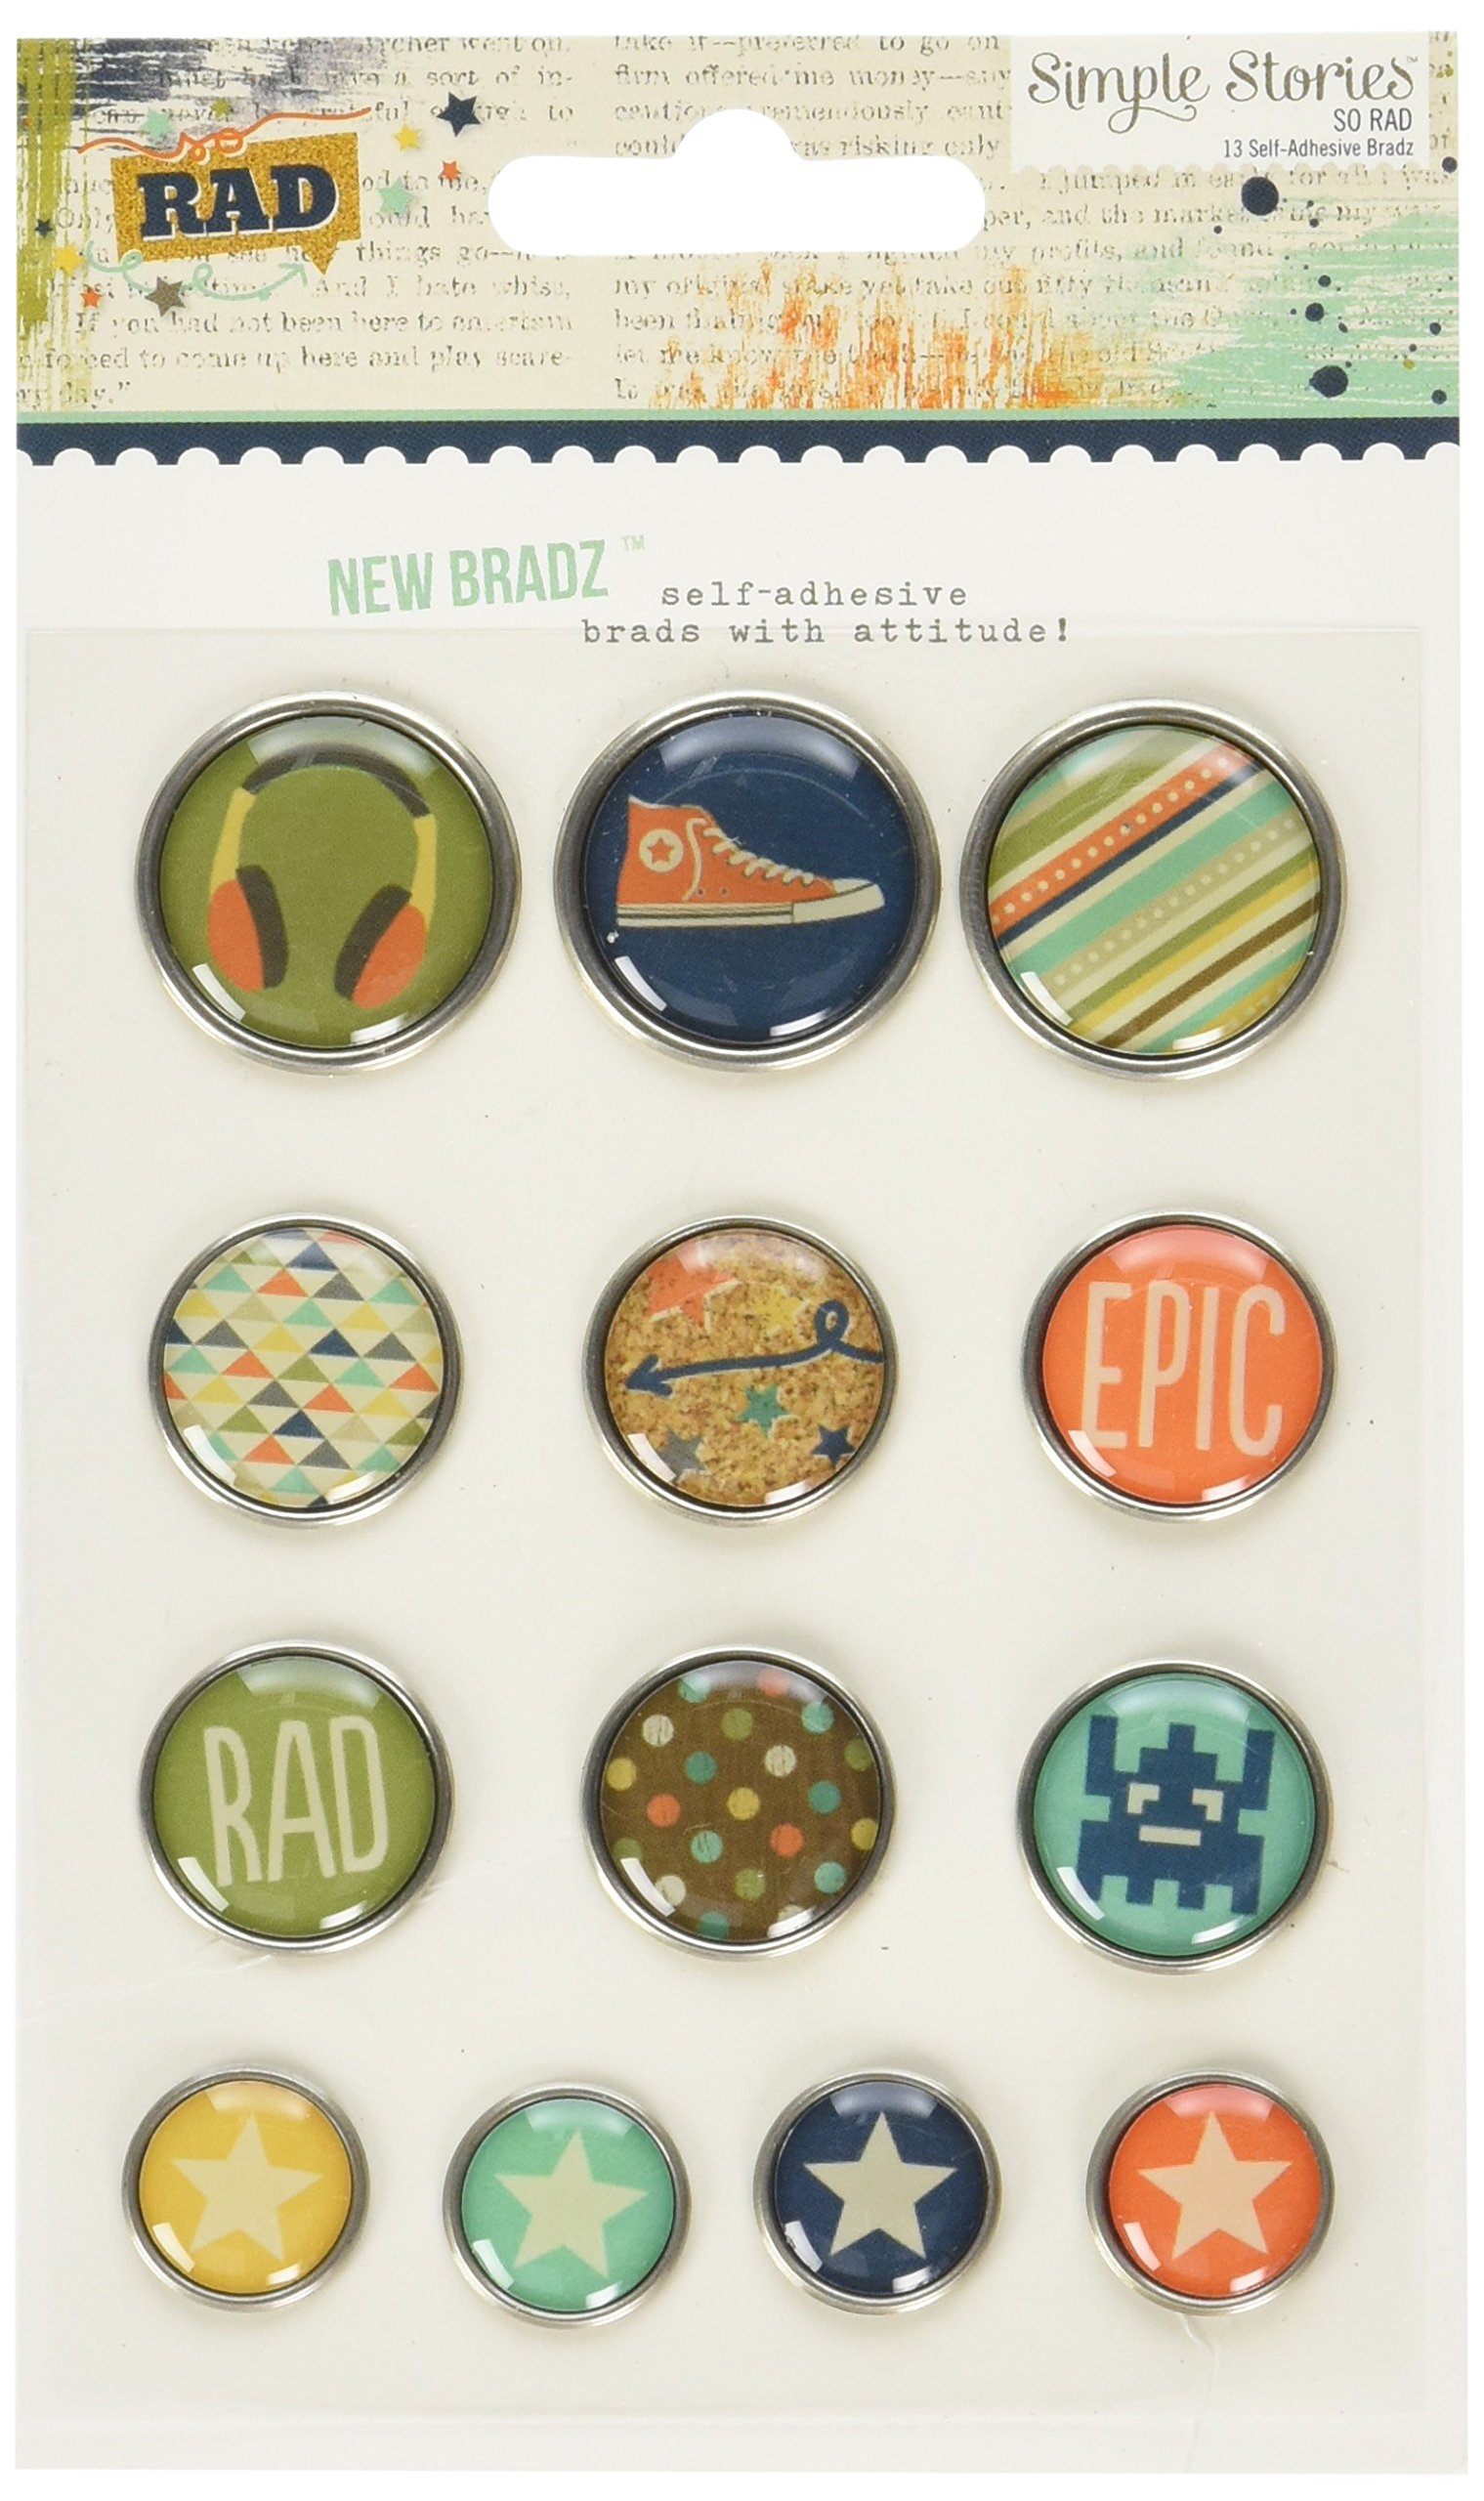 Simple Stories So Rad Self-Adhesive Bradz (13 Pack)